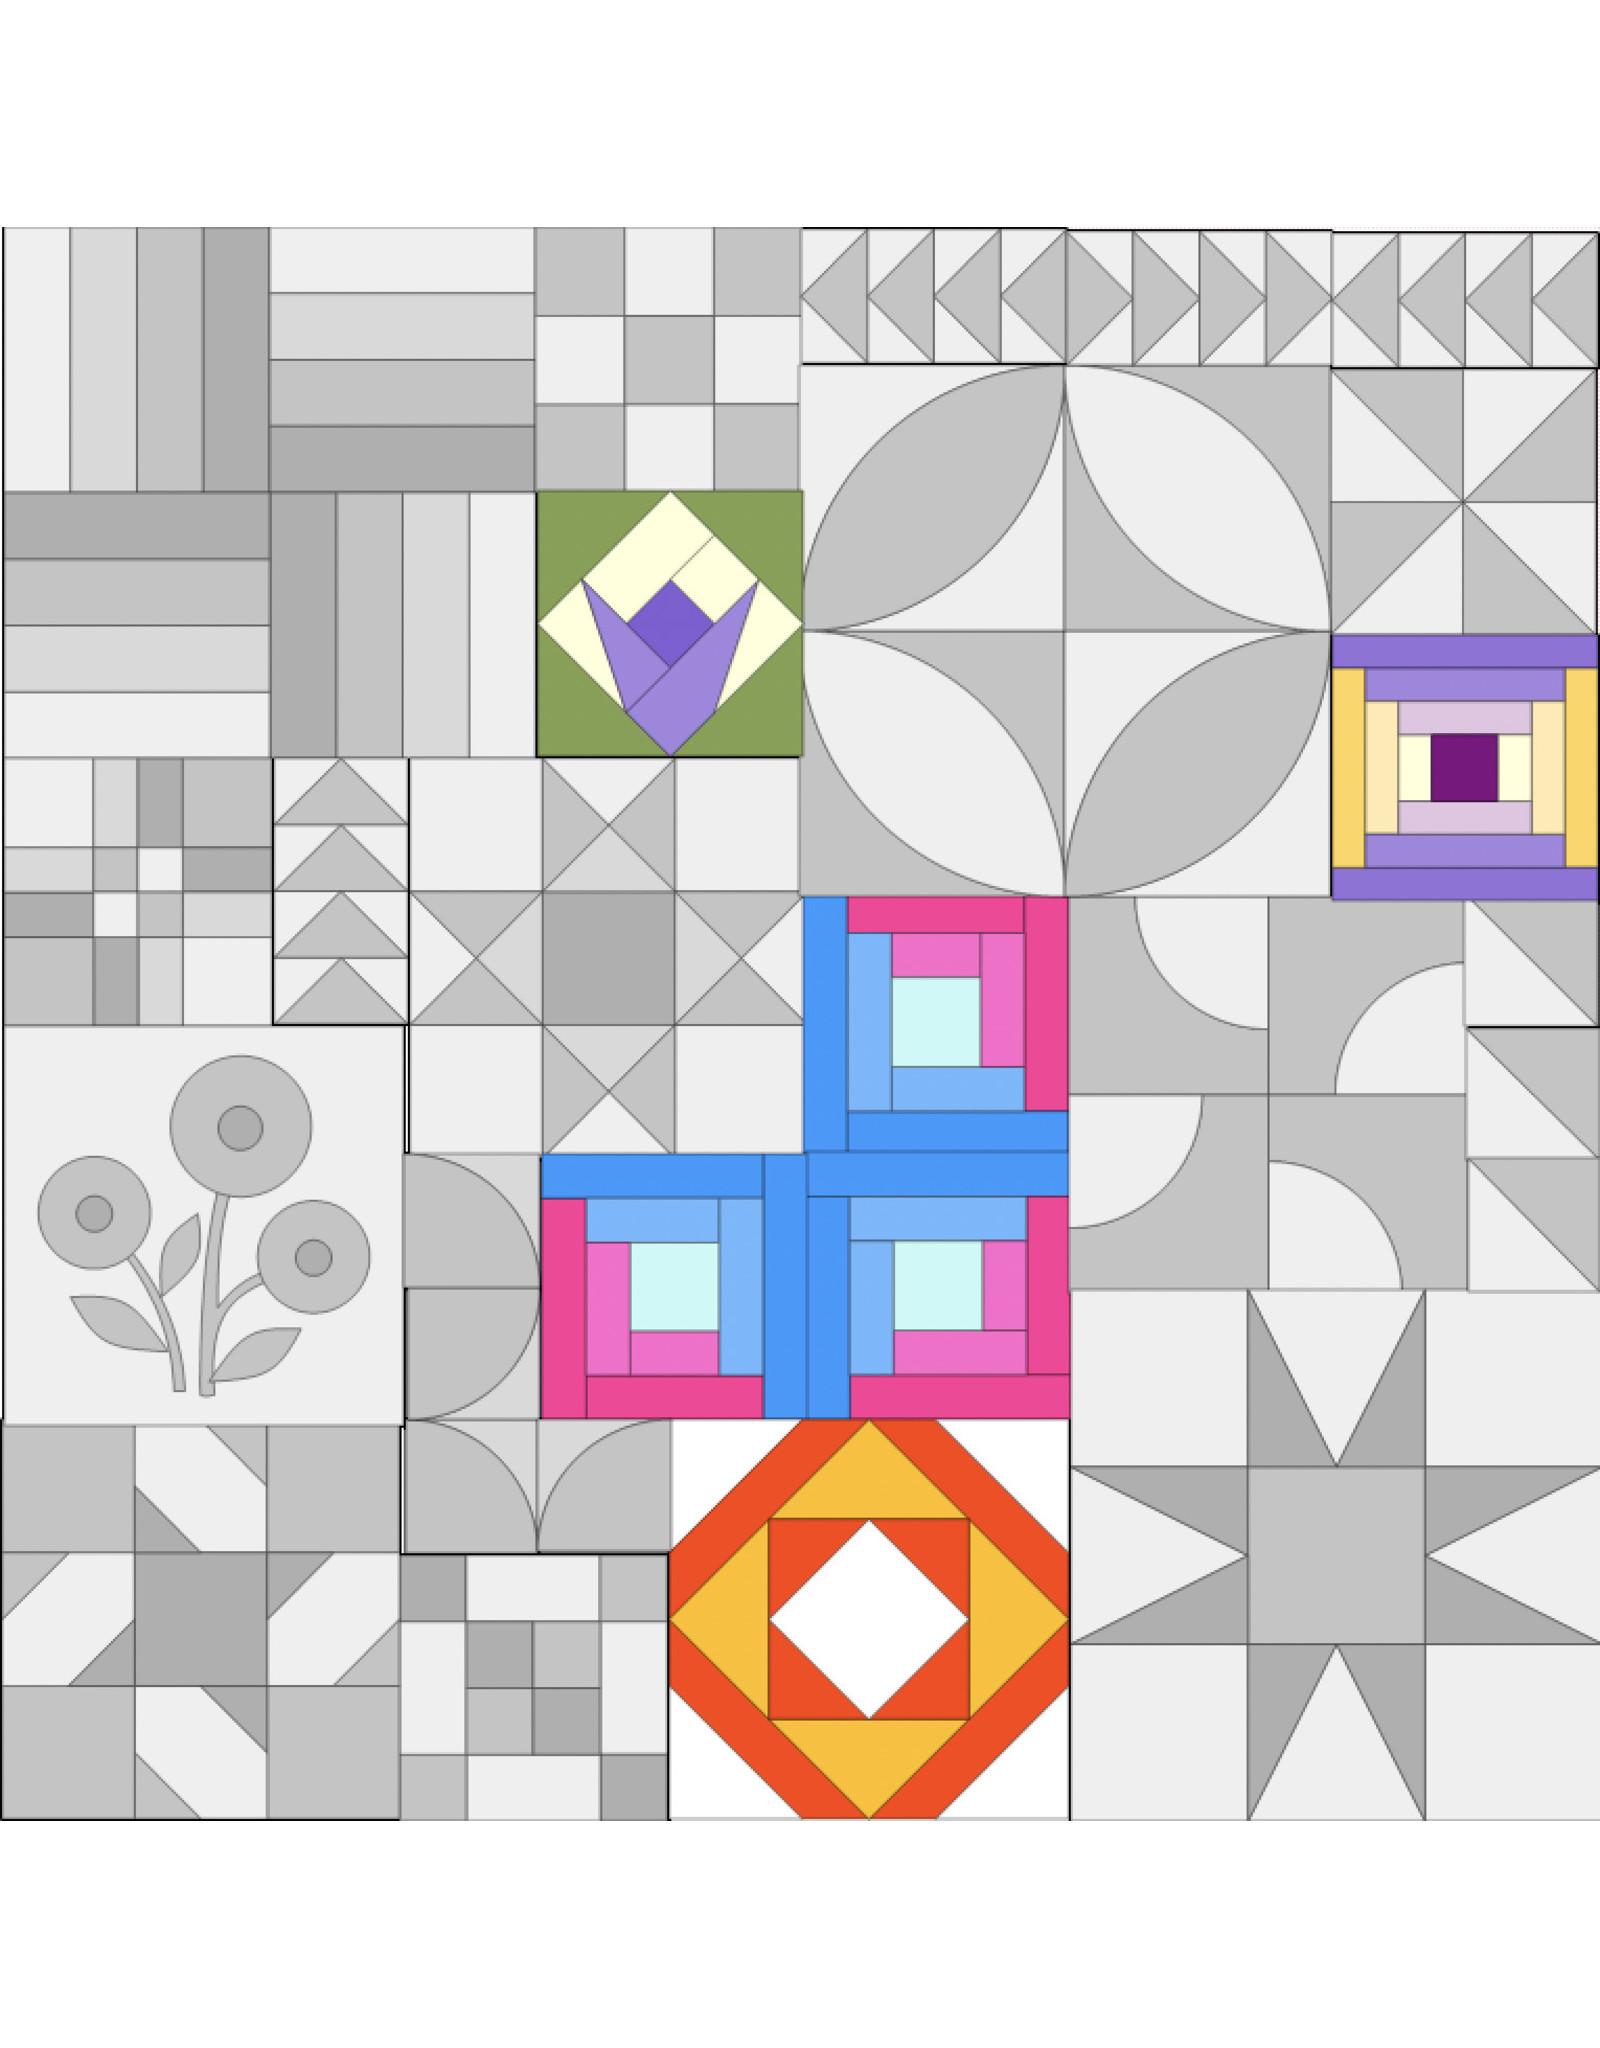 Basiscursus Donderdag - Quilt ABC - Module A